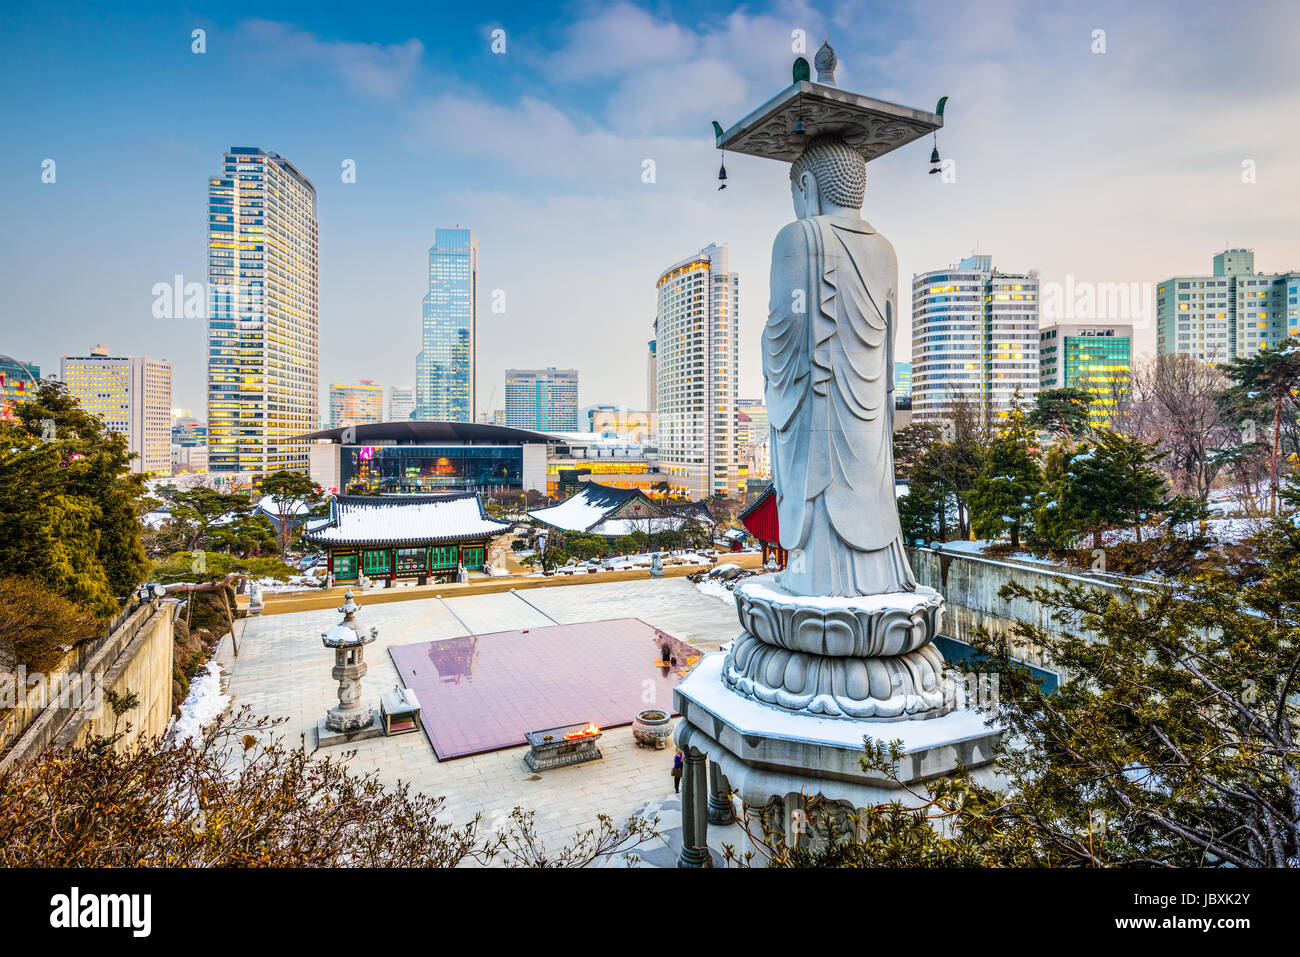 Seoul, South Korea skyline from Bongeunsa Temple. - Stock Image